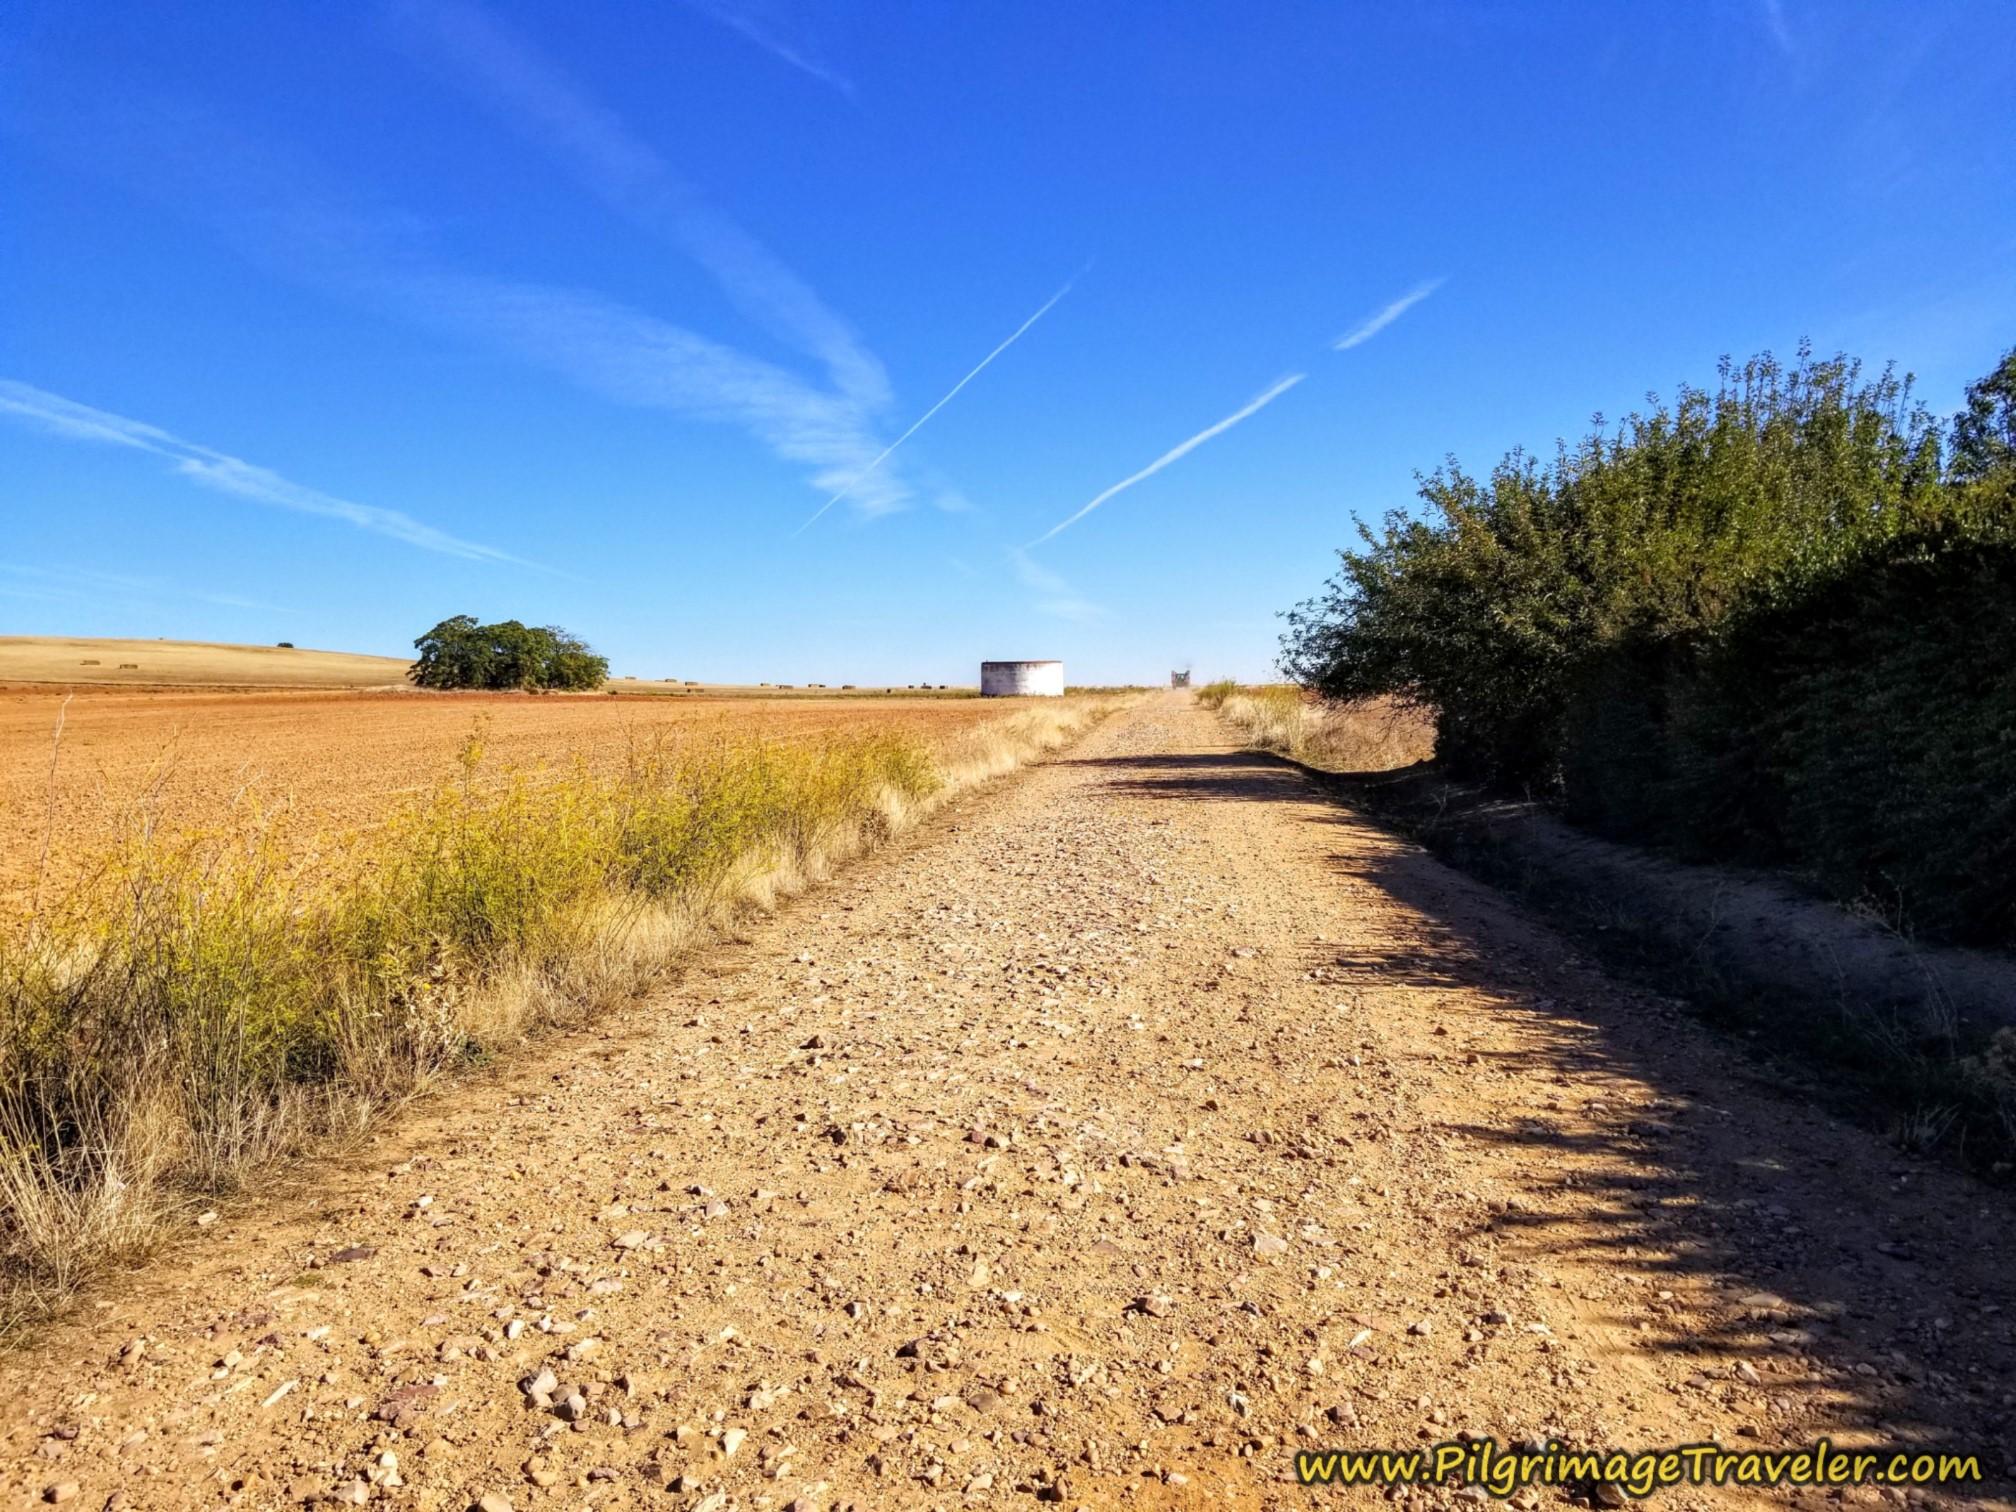 Back on Open Road on the Vía de la Plata from Montamarta to Granja de Moreruela